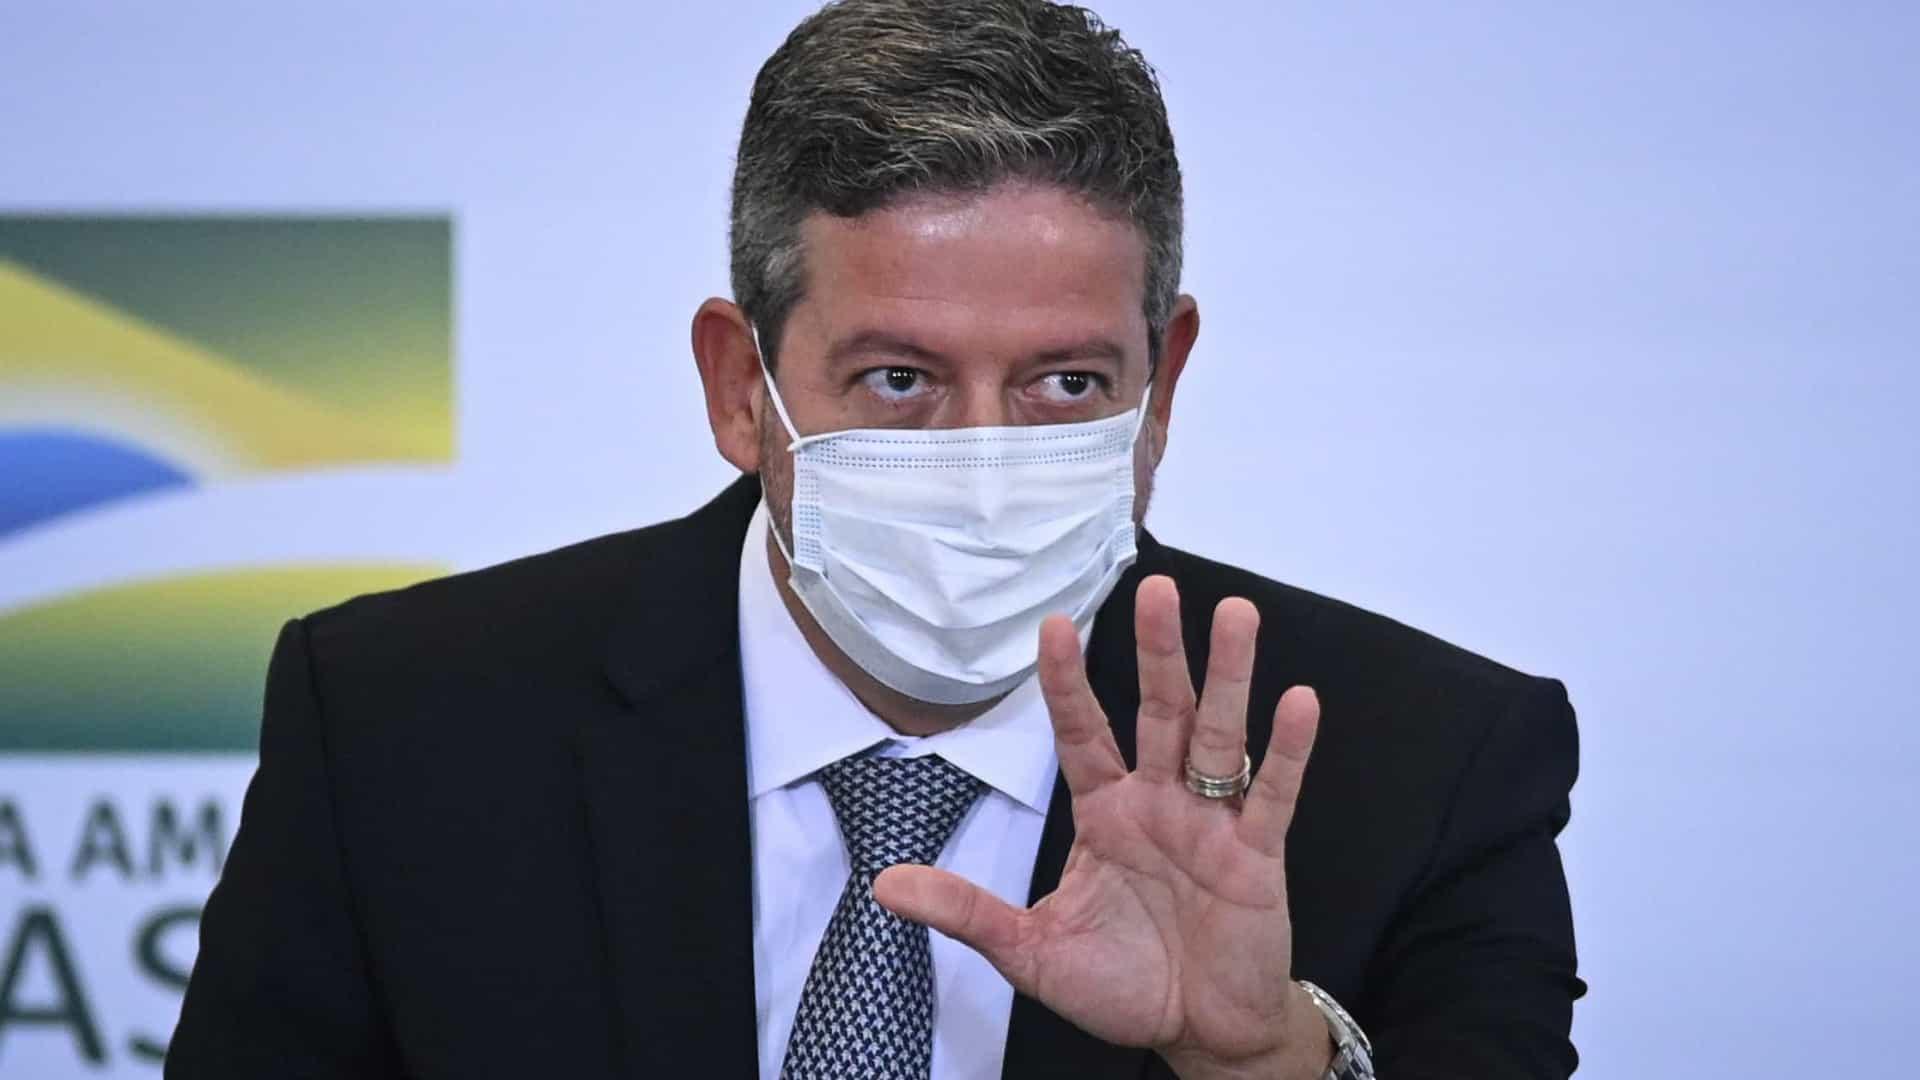 naom 6026fa7f395f9 - Lira diz estar analisando pedidos de impeachment contra Bolsonaro